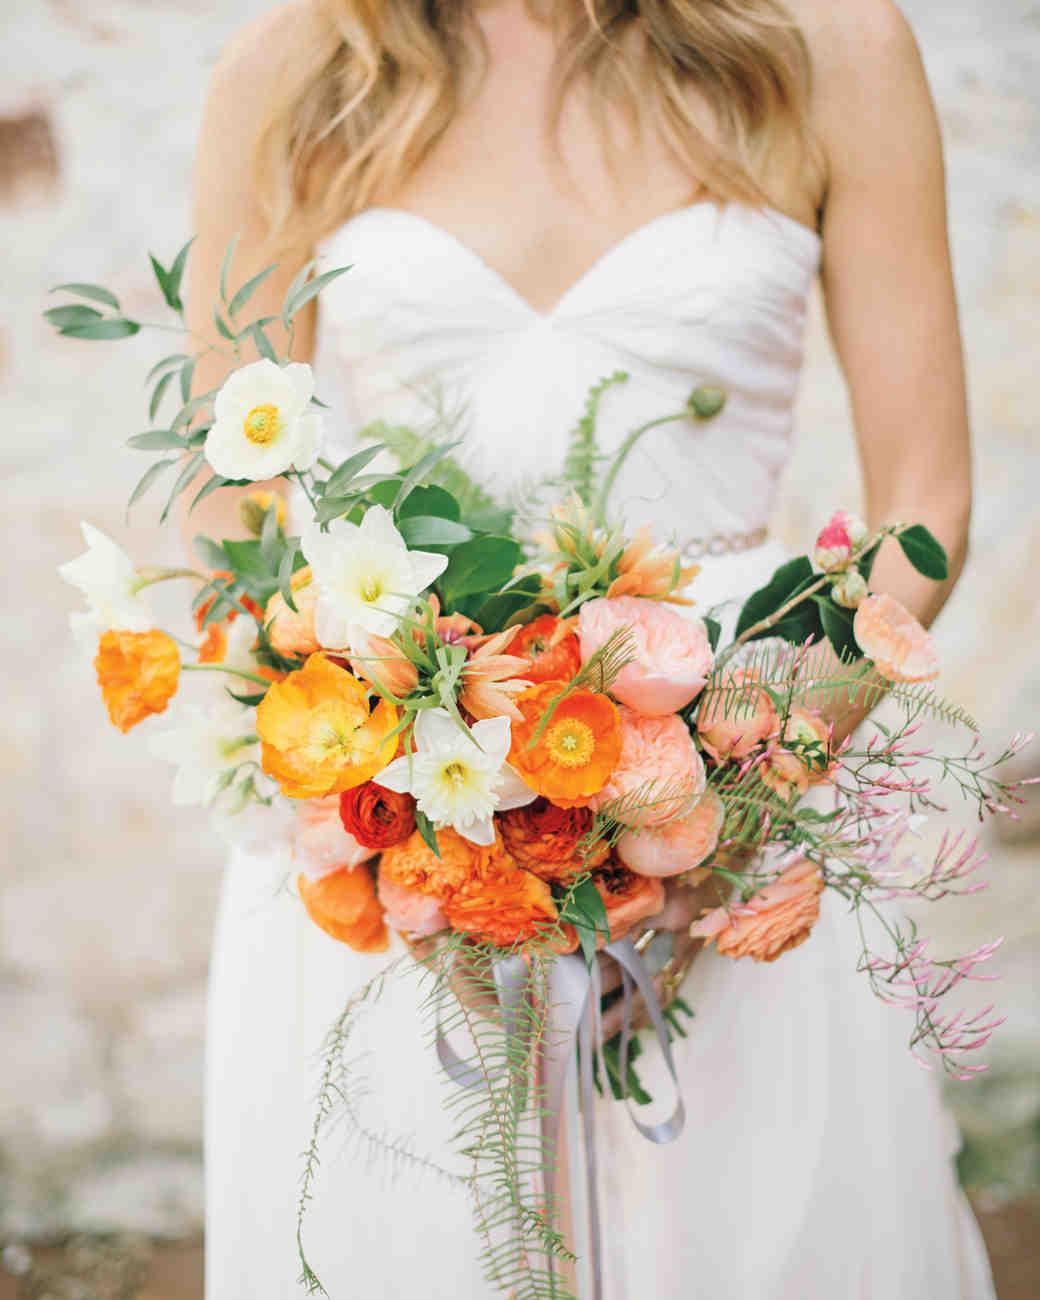 The 50 Best Wedding Bouquets | Martha Stewart Weddings